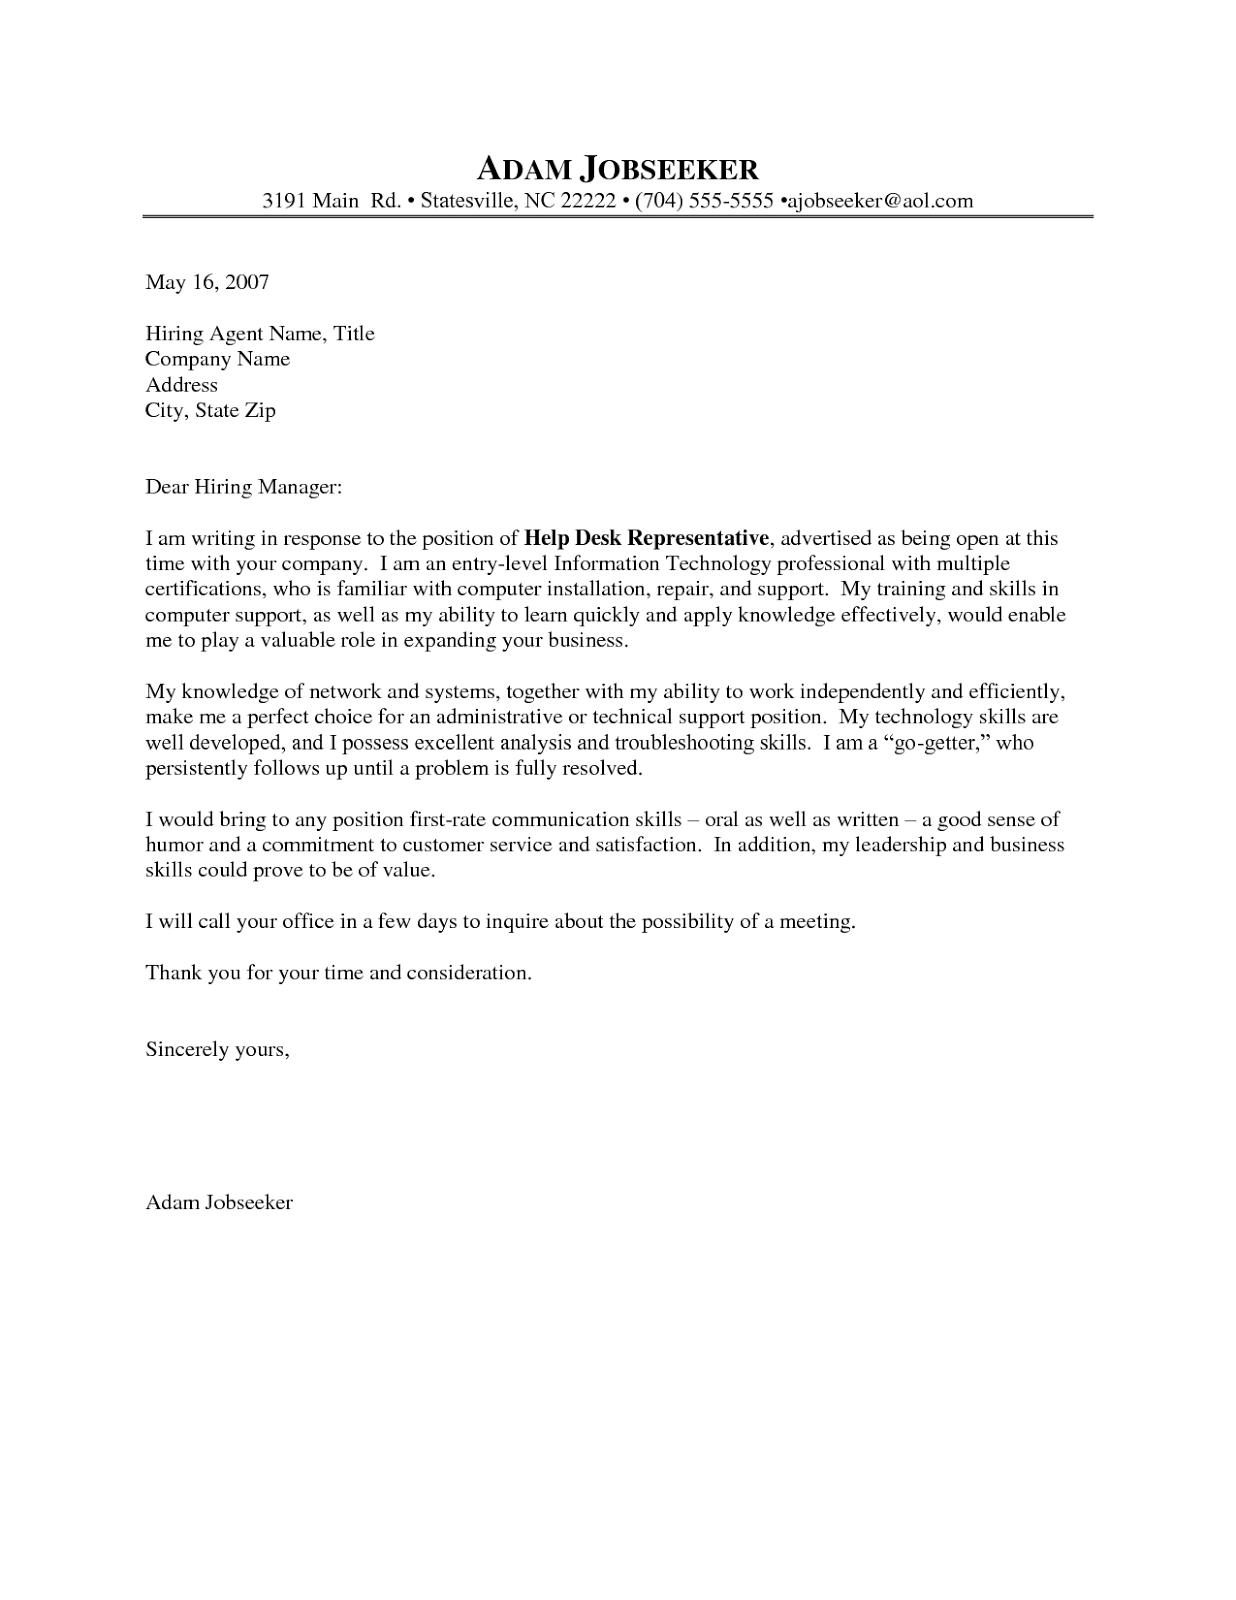 Cover letter format referral